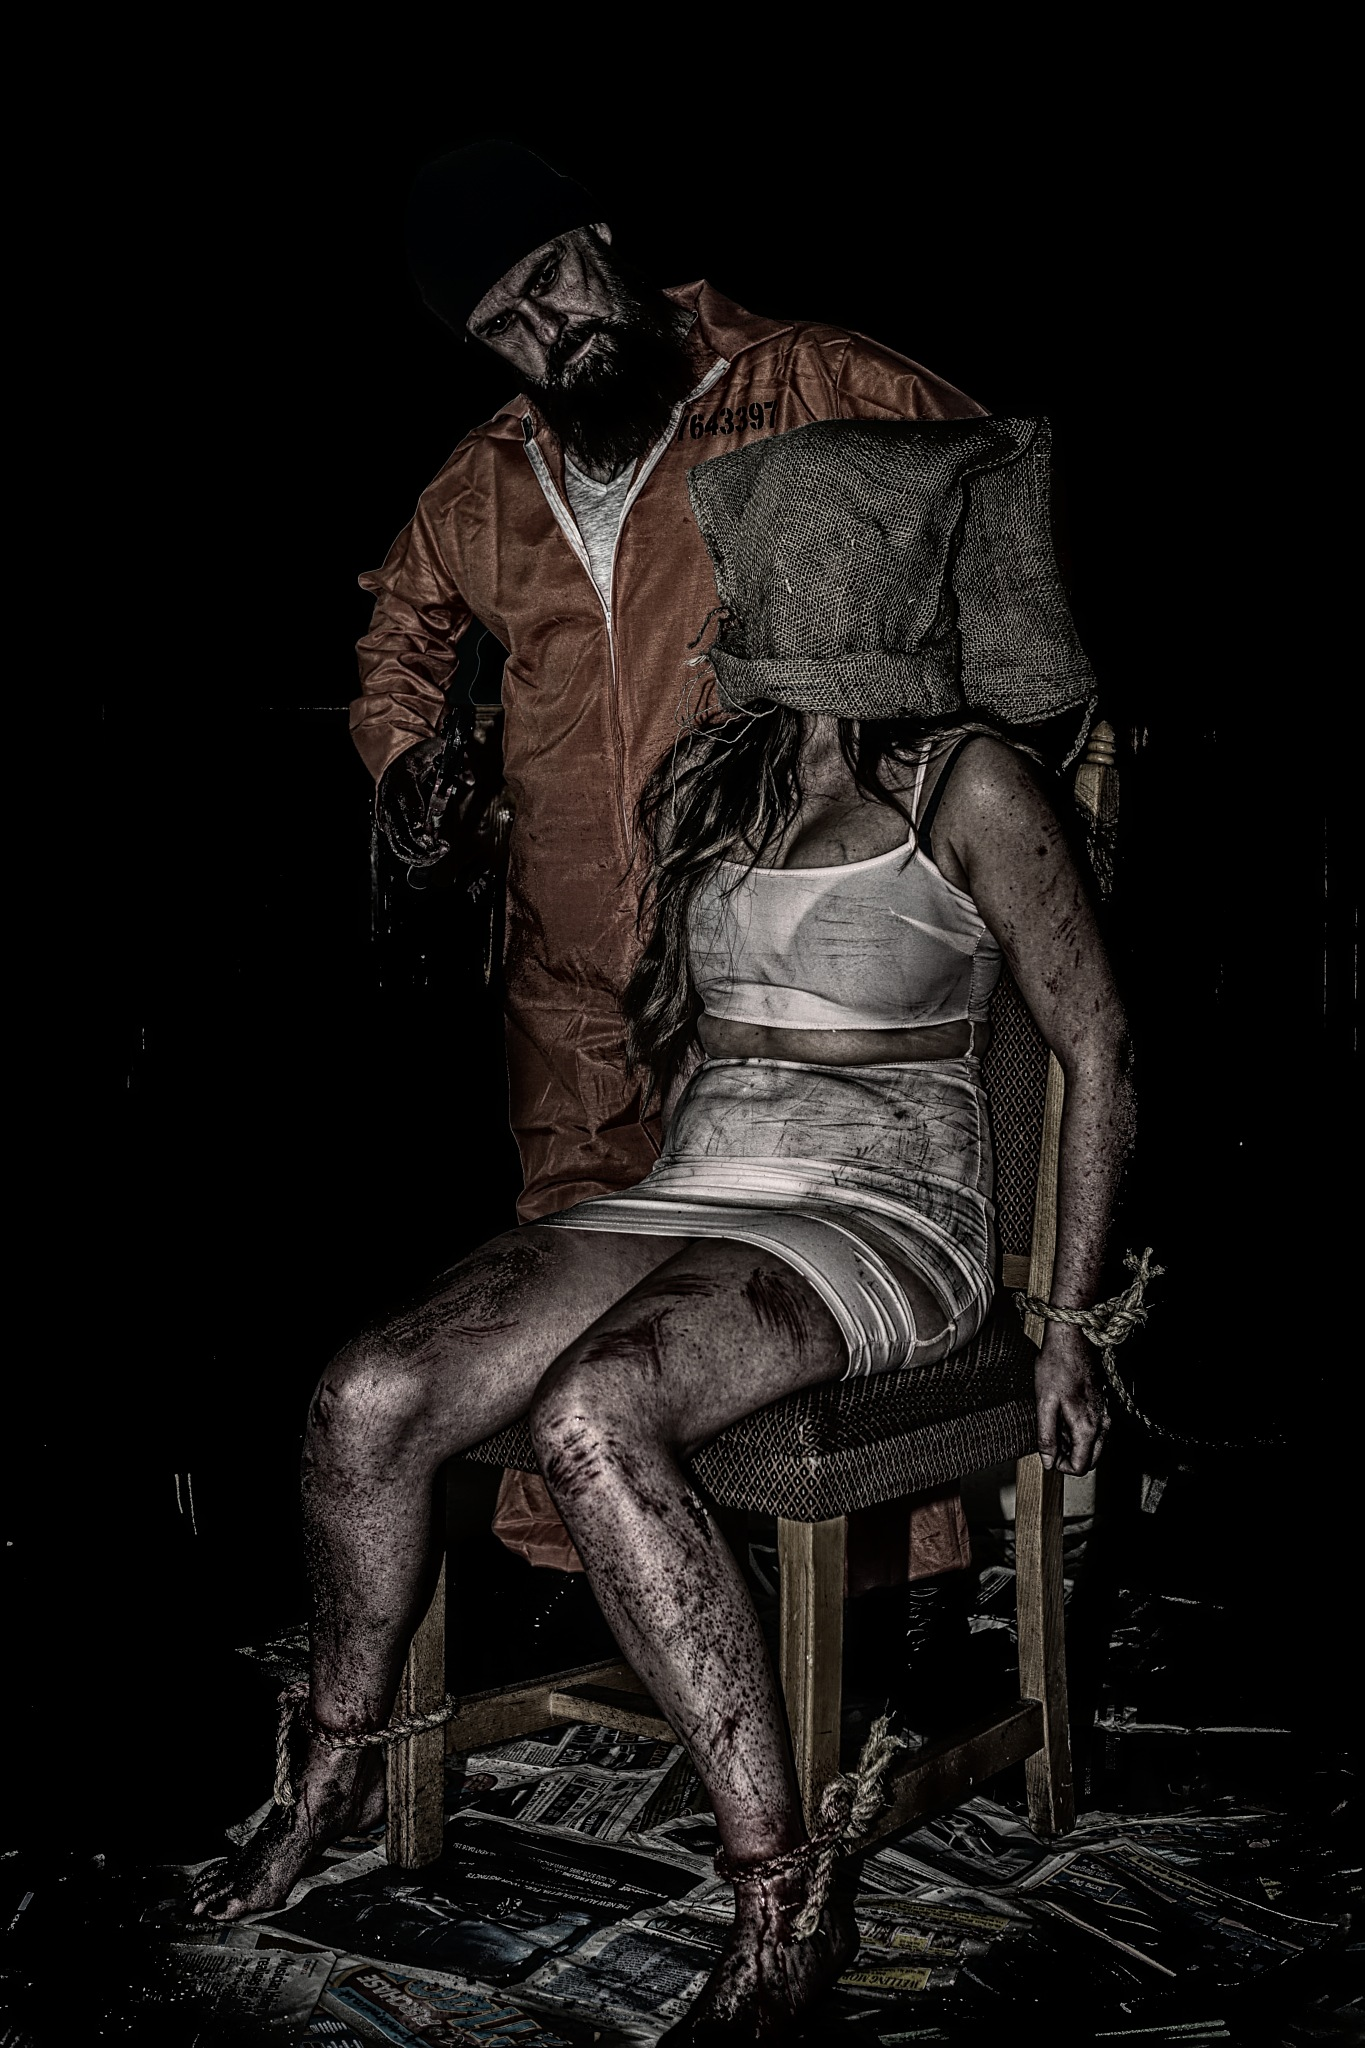 Hostile. by Photographer Gino Cinganelli